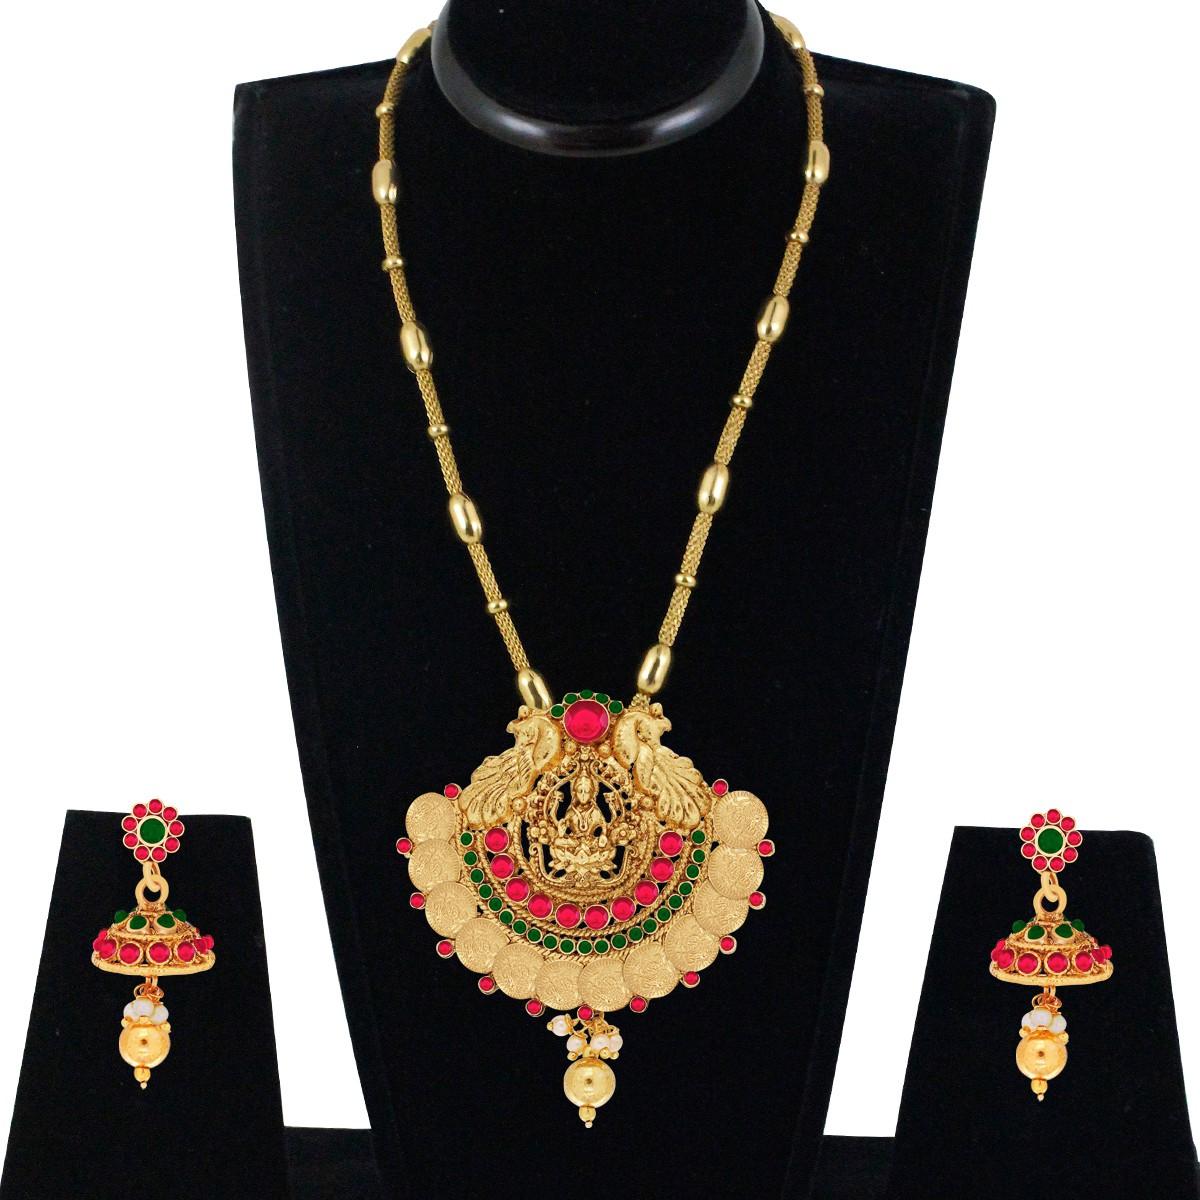 Deals - Delhi - Spargz <br> Earrings, Pendants, Sets...<br> Category - jewellery<br> Business - Flipkart.com